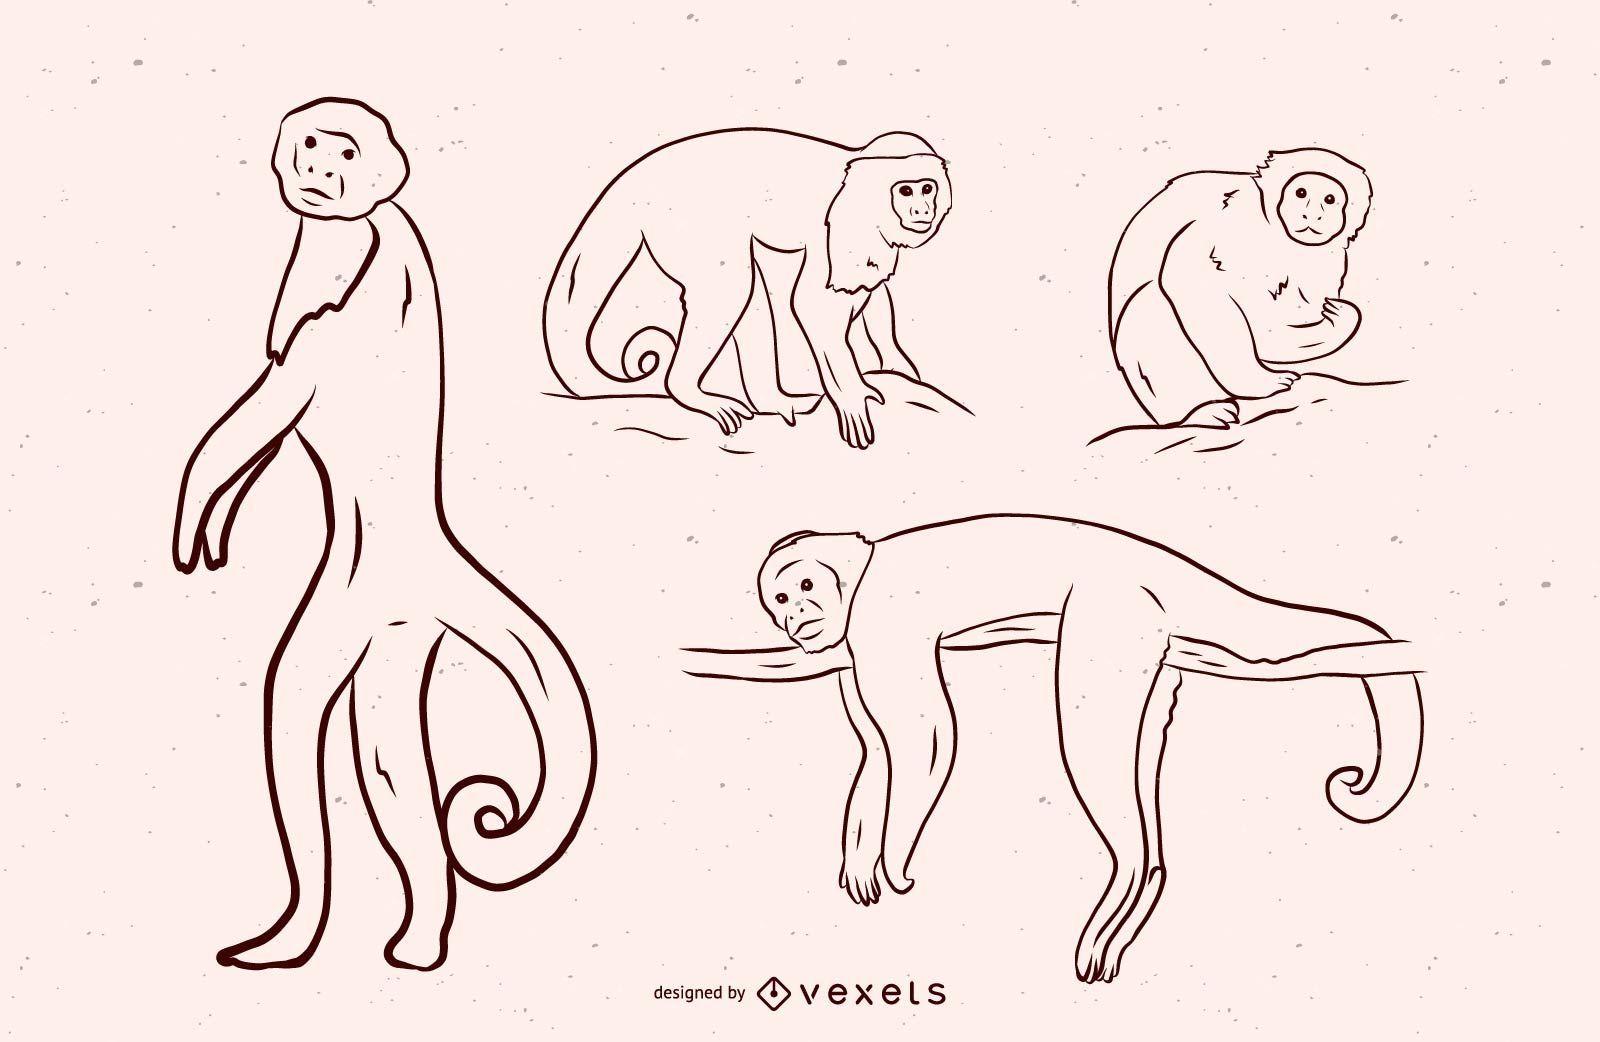 Monkey Black and White Illustration Design